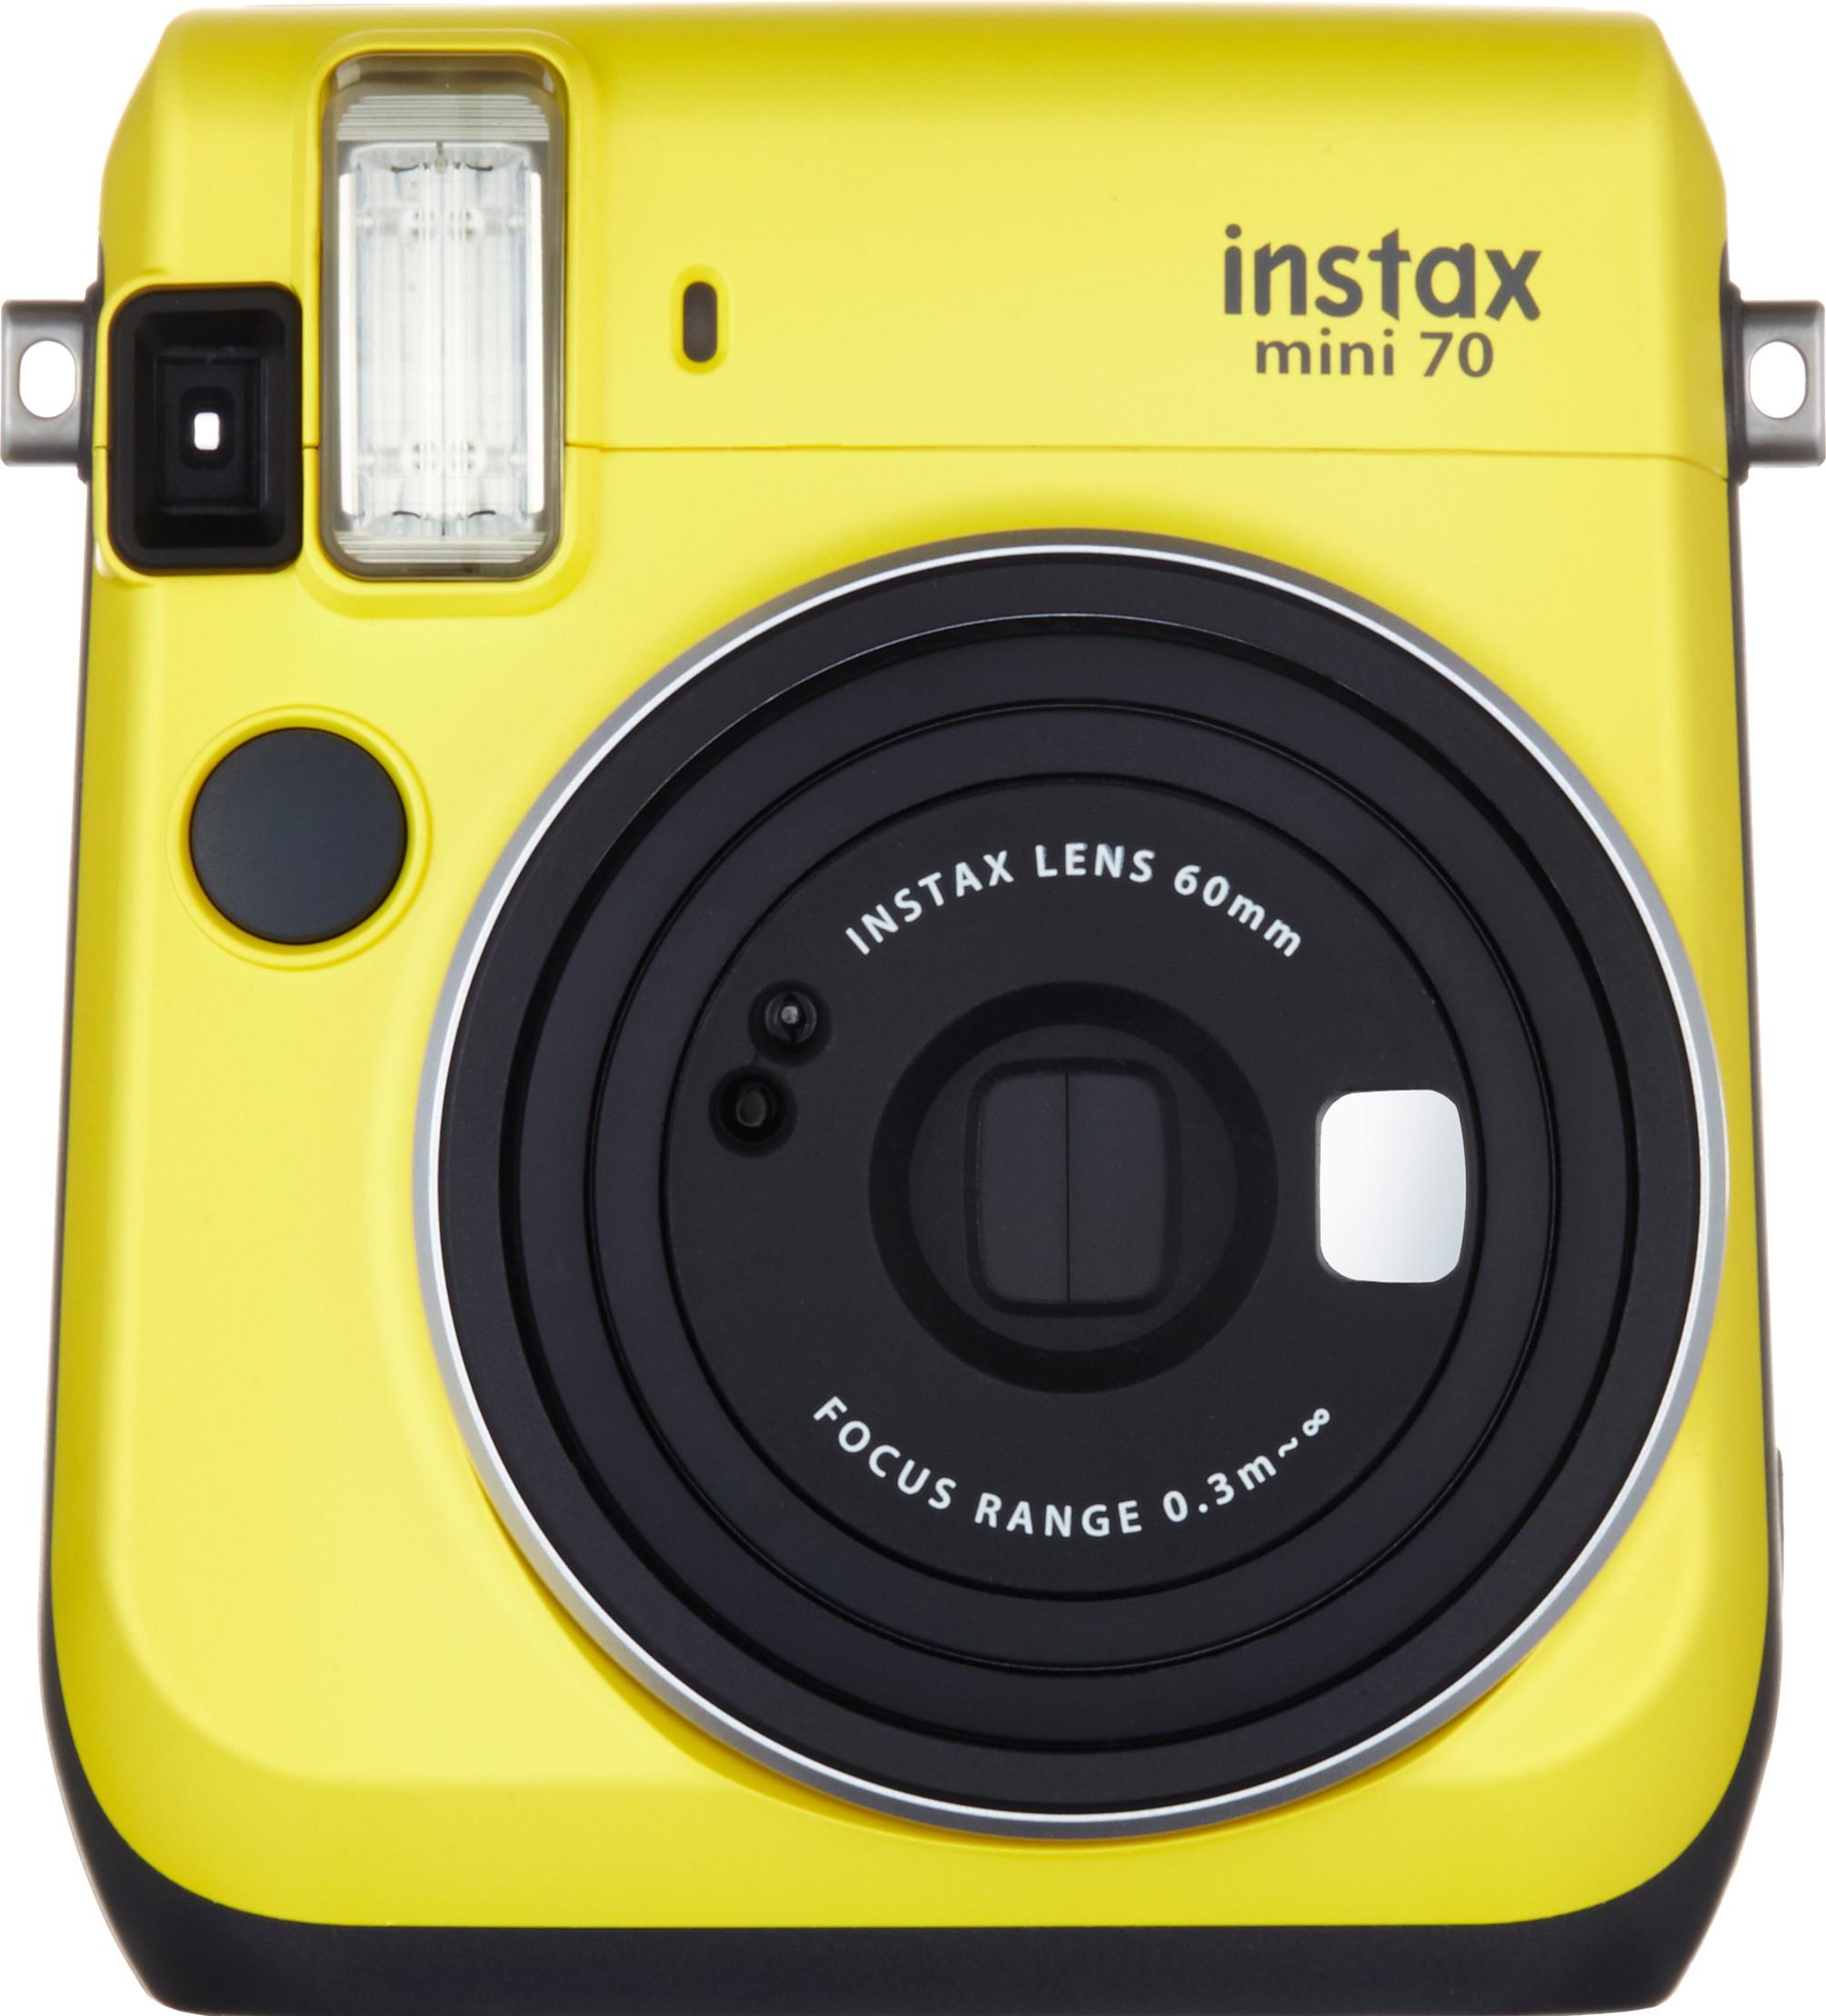 Deals | Under ₹9,999 Instant Camera